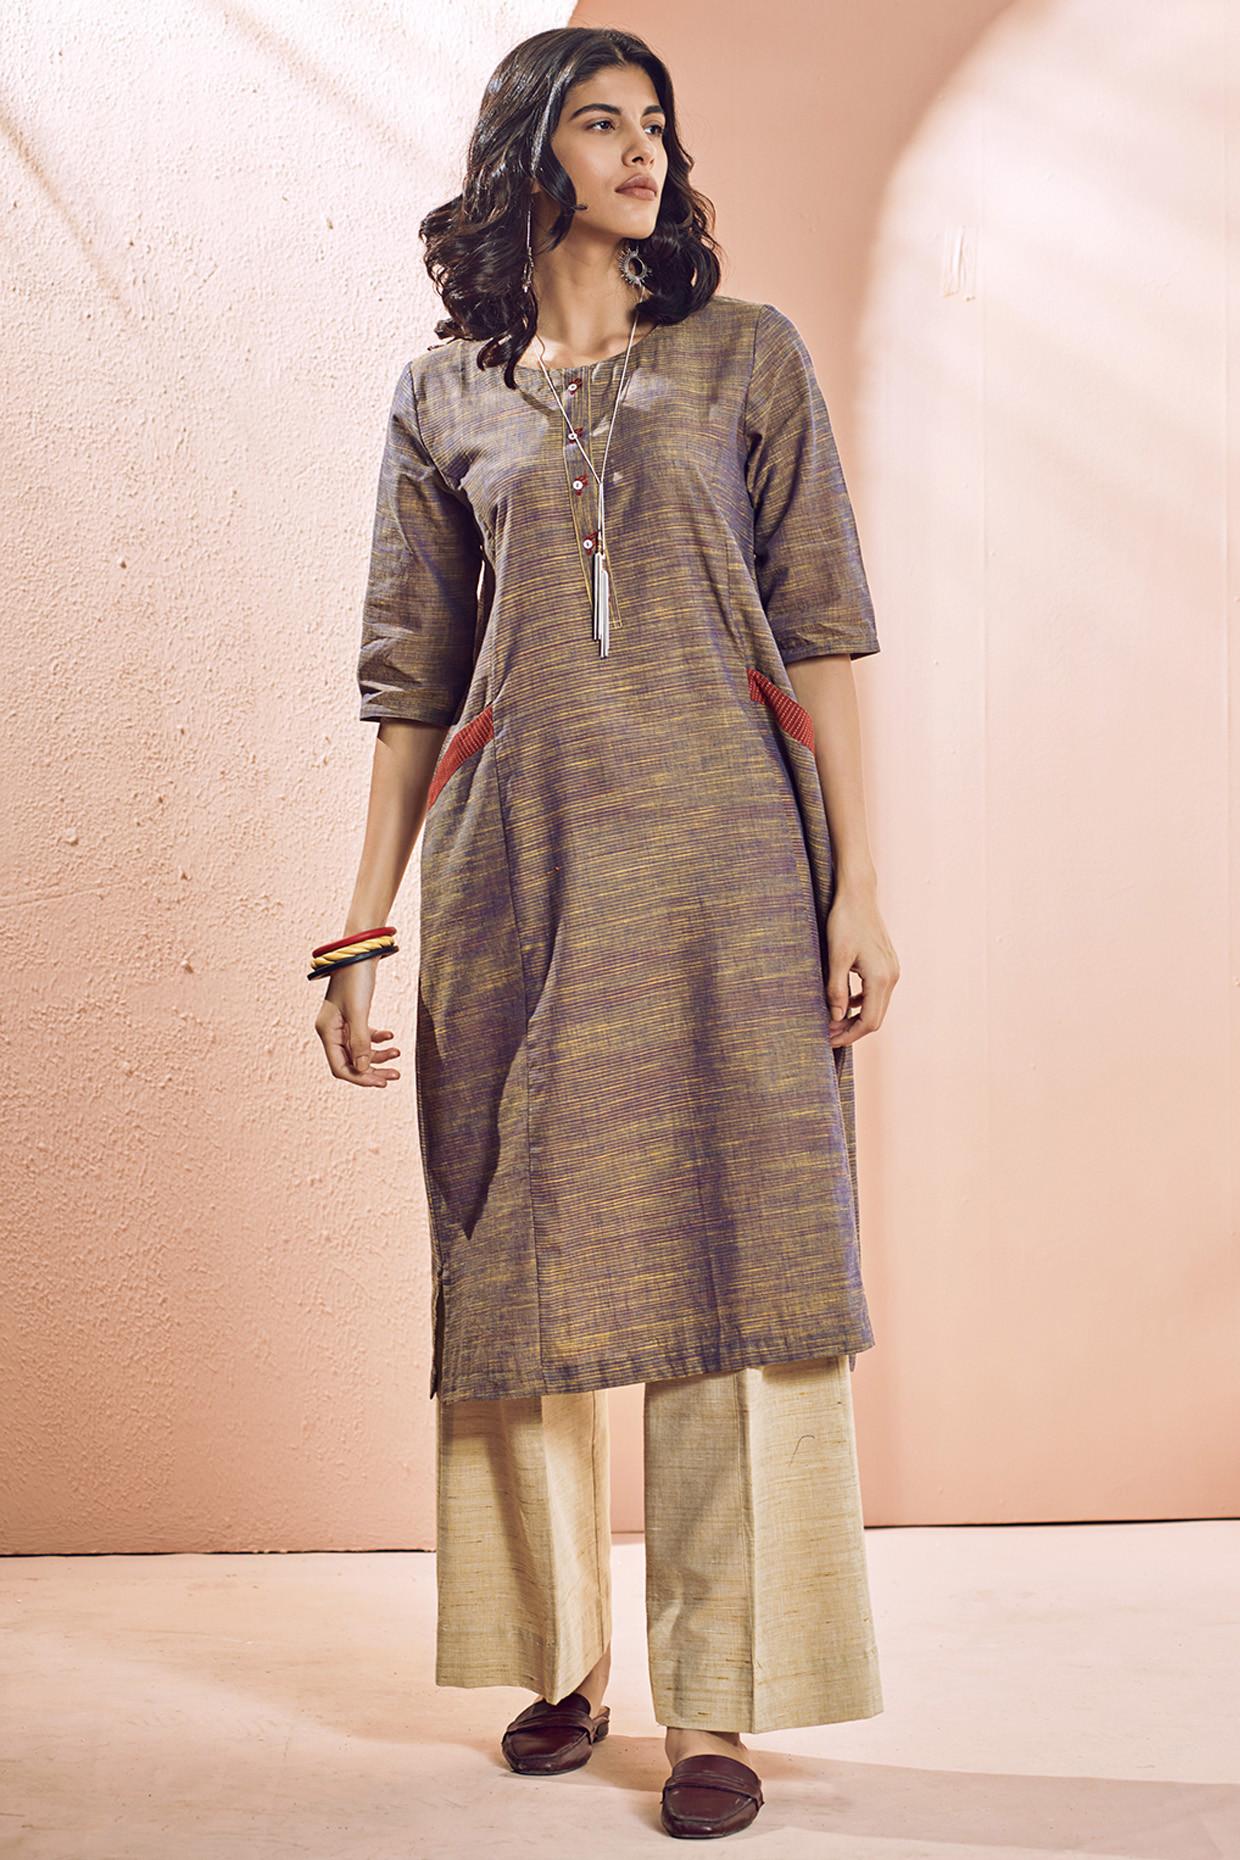 Ochre Handloom Cotton Maithili Kurti by House Of Idar